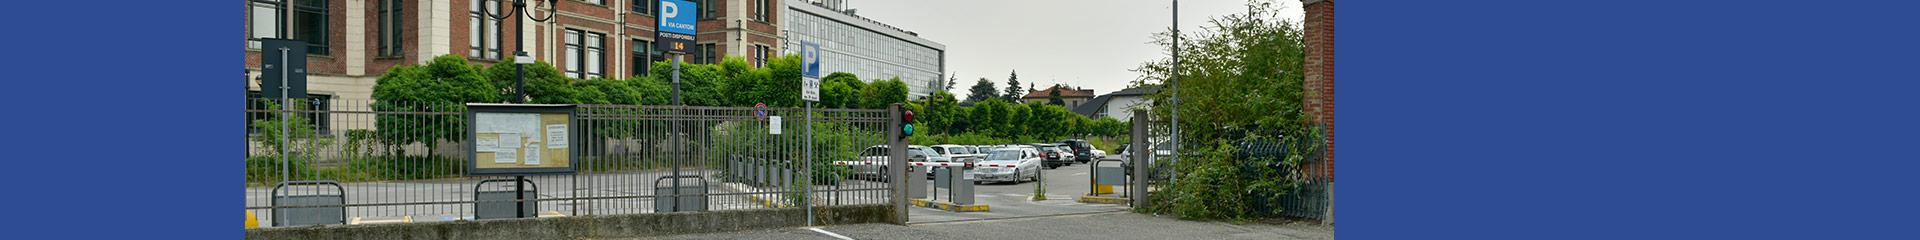 bg-1920×240-parcheggio-cantoni-2